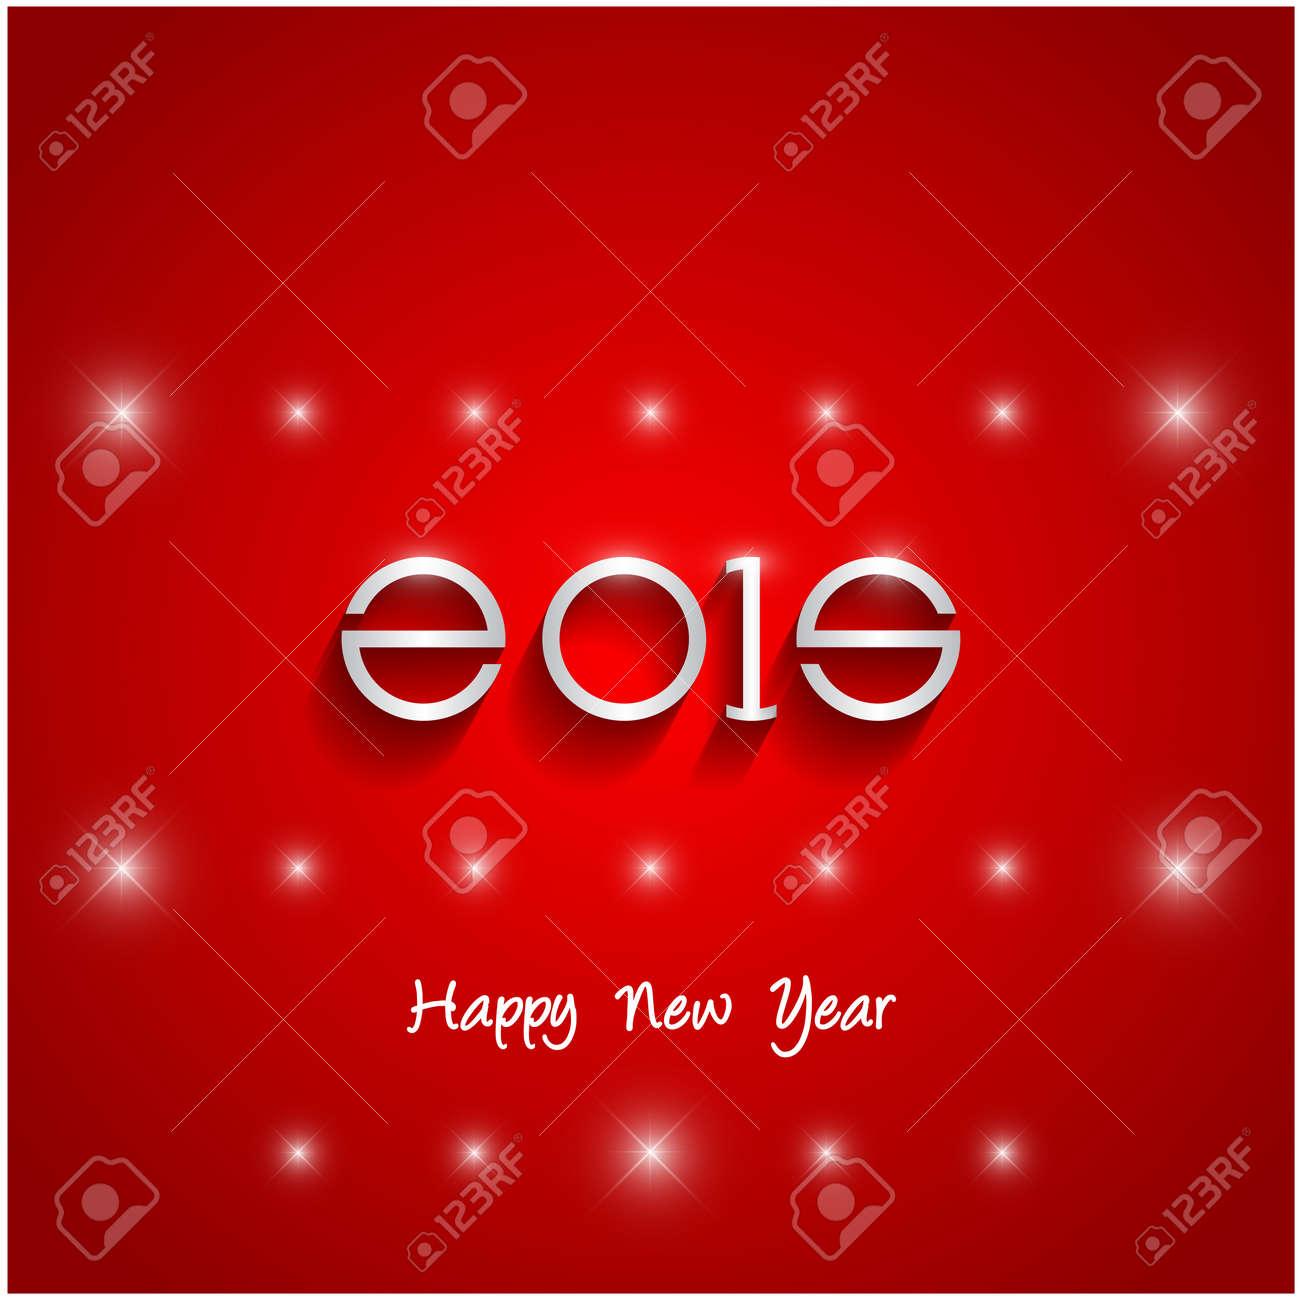 Happy new year 2015 creative greeting card design in flat style happy new year 2015 creative greeting card design in flat style with long shadow vector m4hsunfo